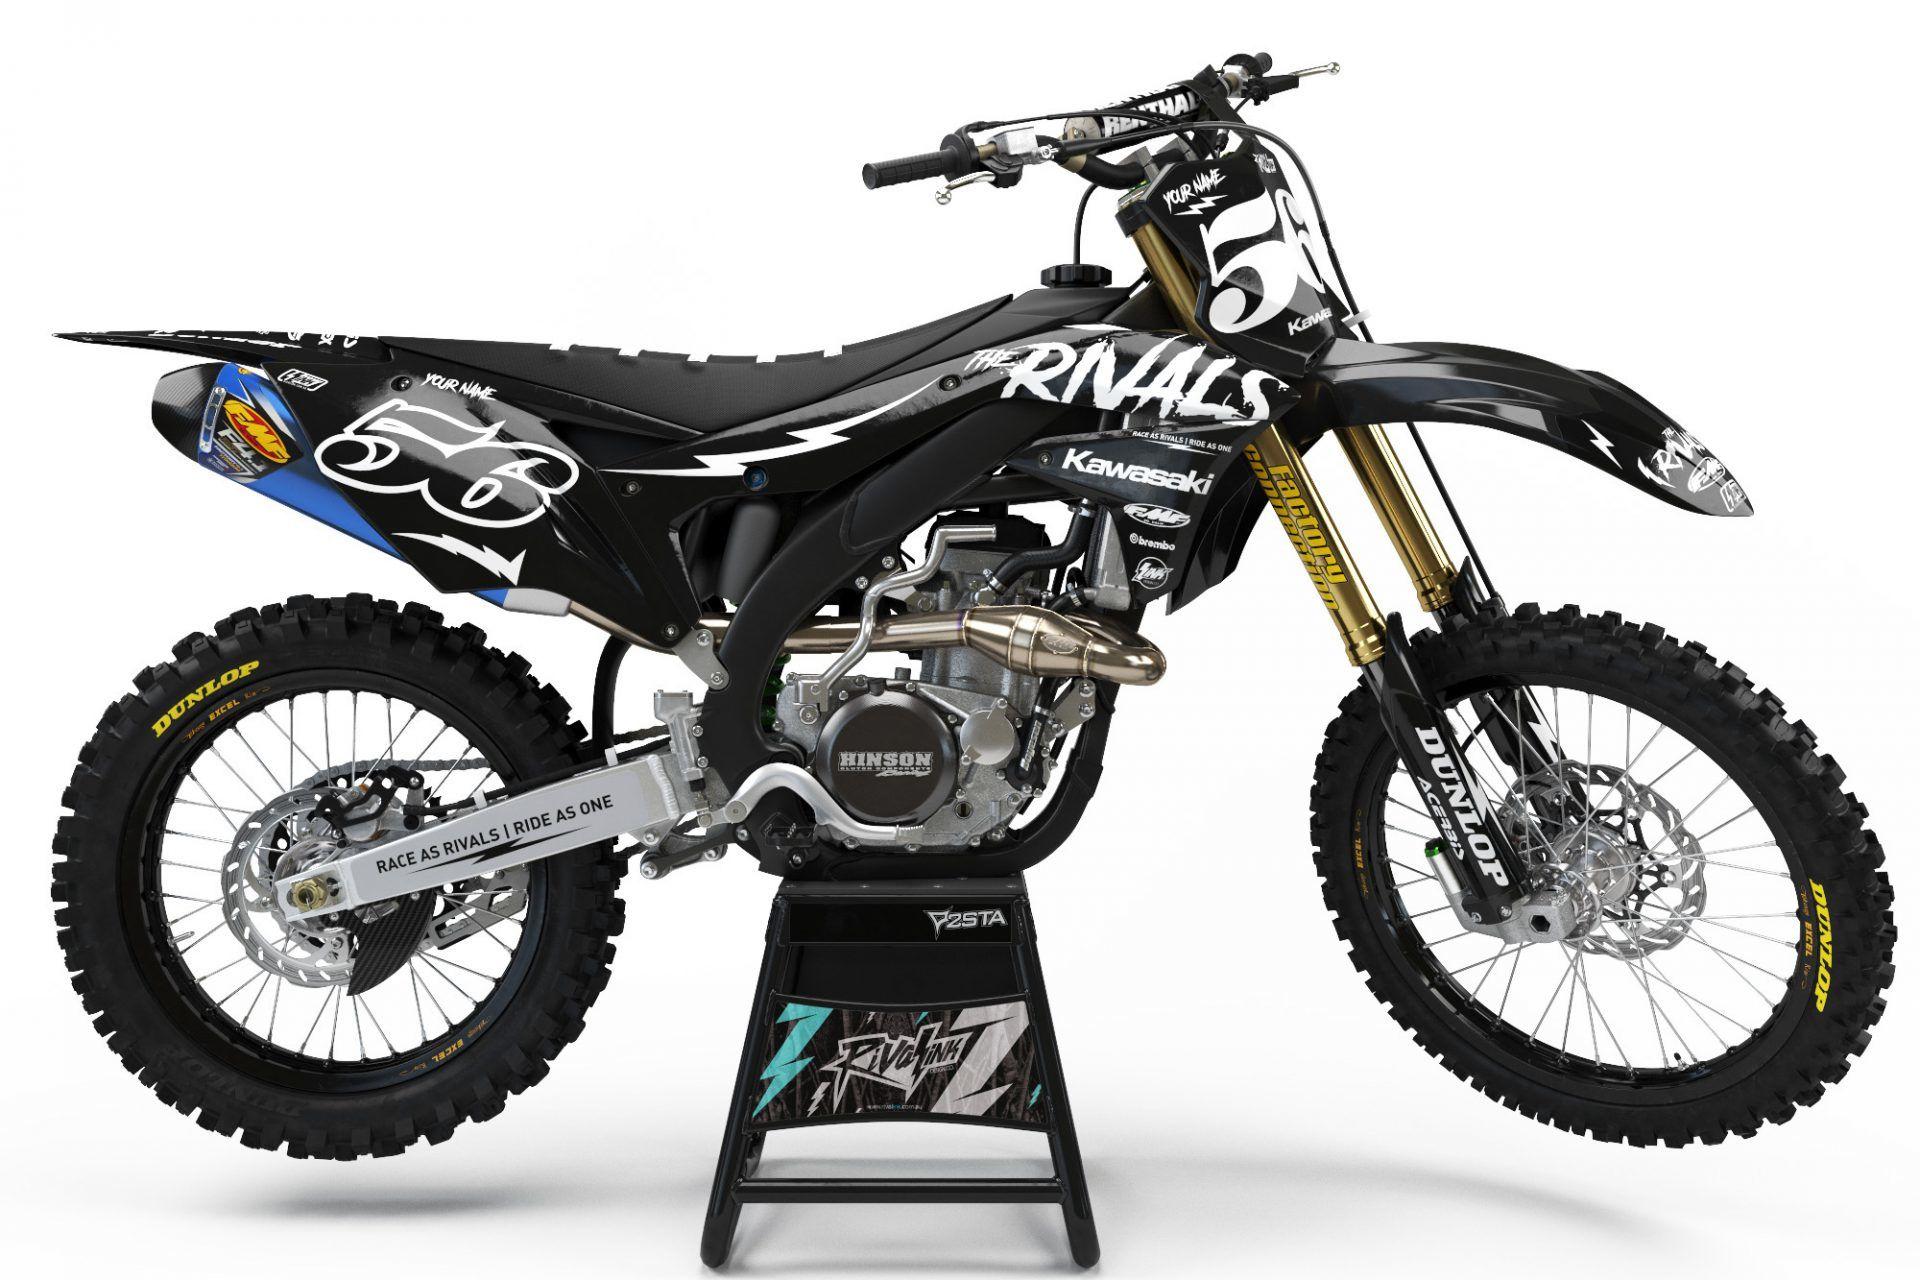 kawasaki 'the rivals' kit - rival ink design co | custom motocross